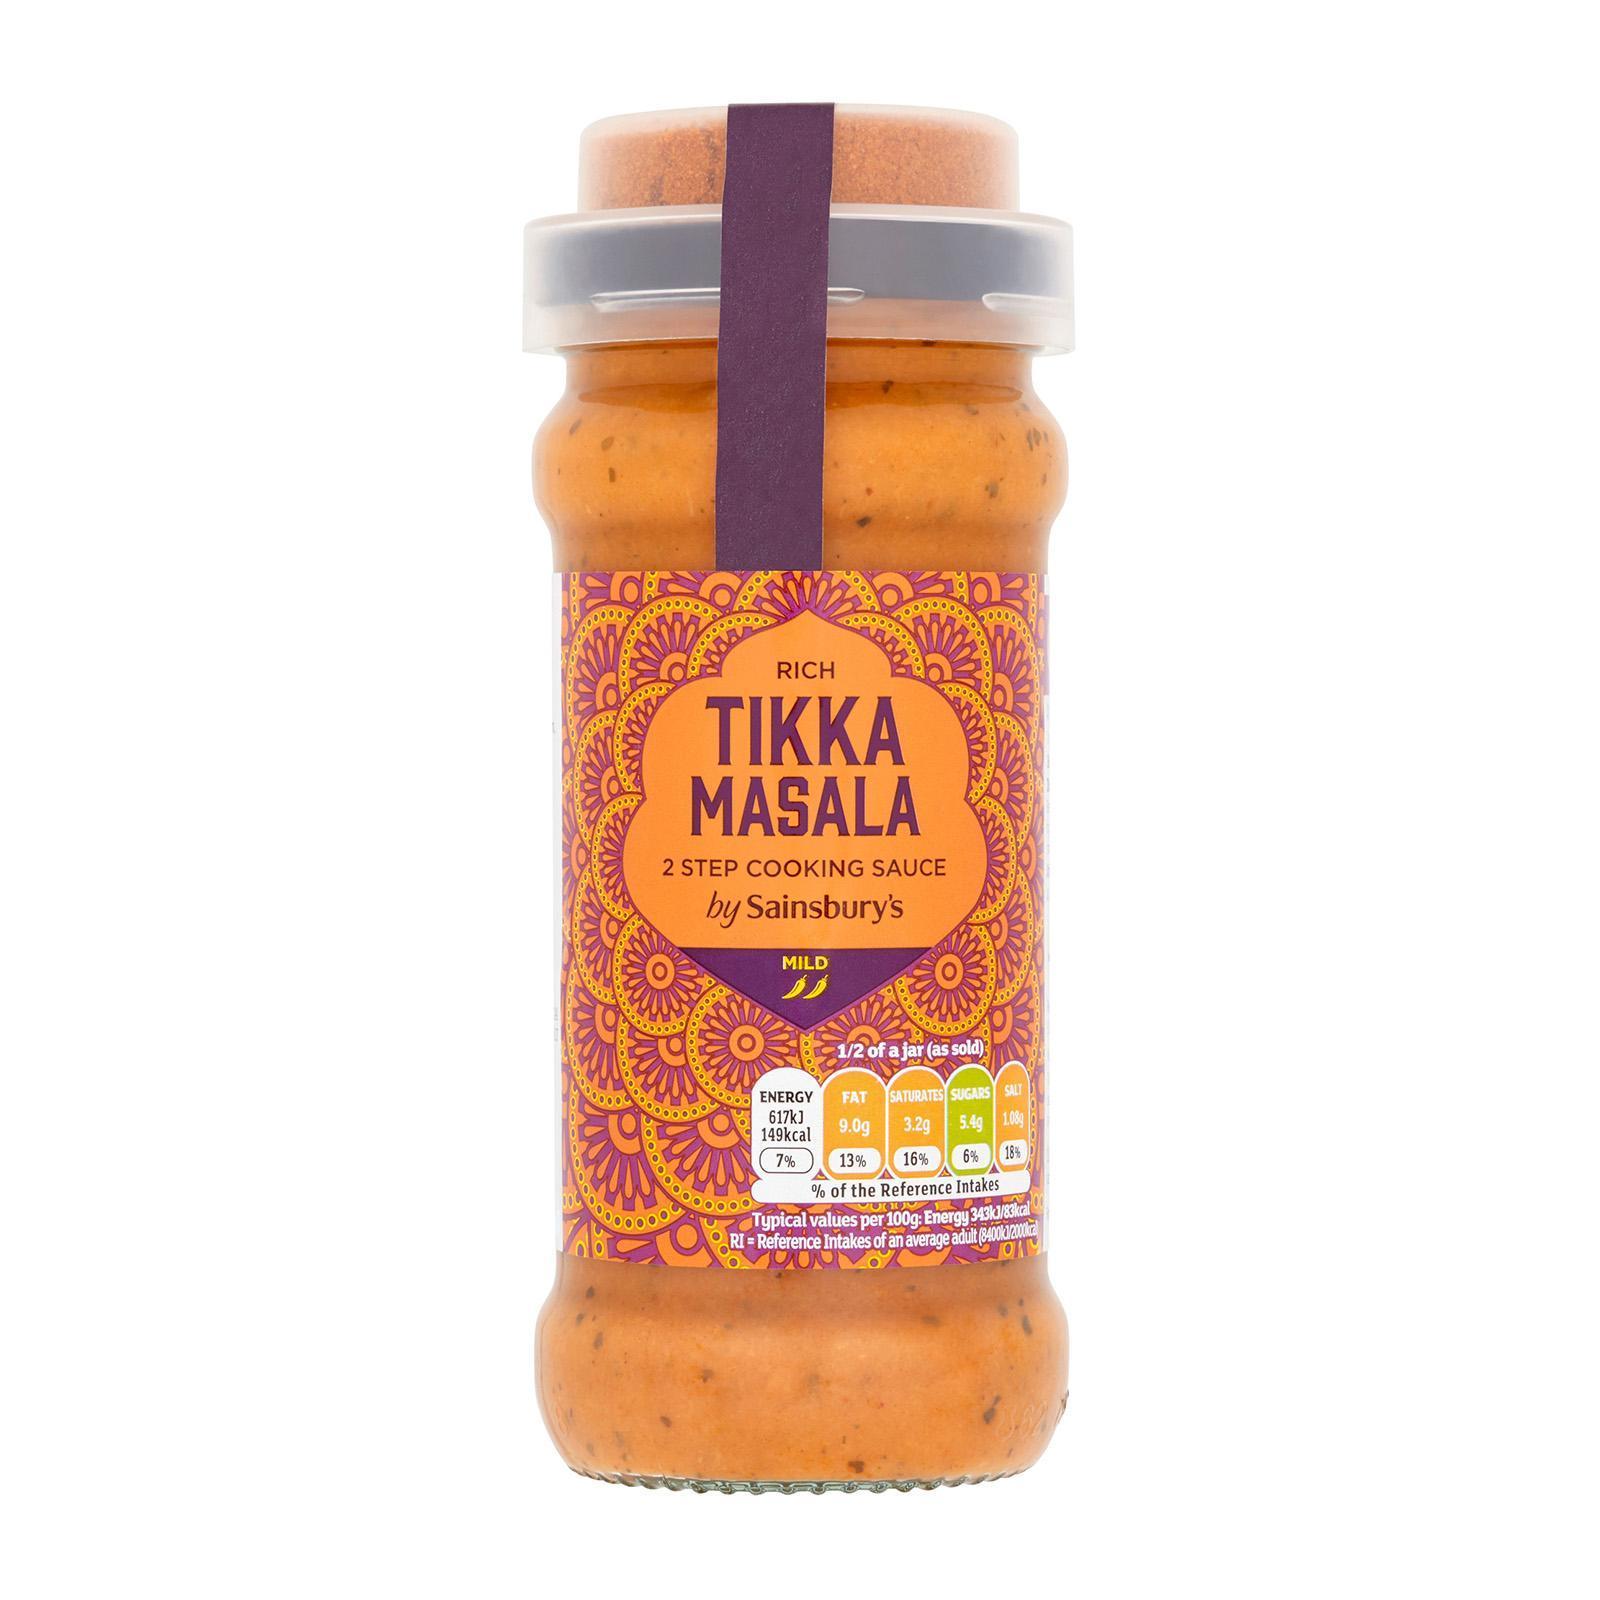 Sainsbury's Rich Tikka Masala 2 Step Cooking Sauce